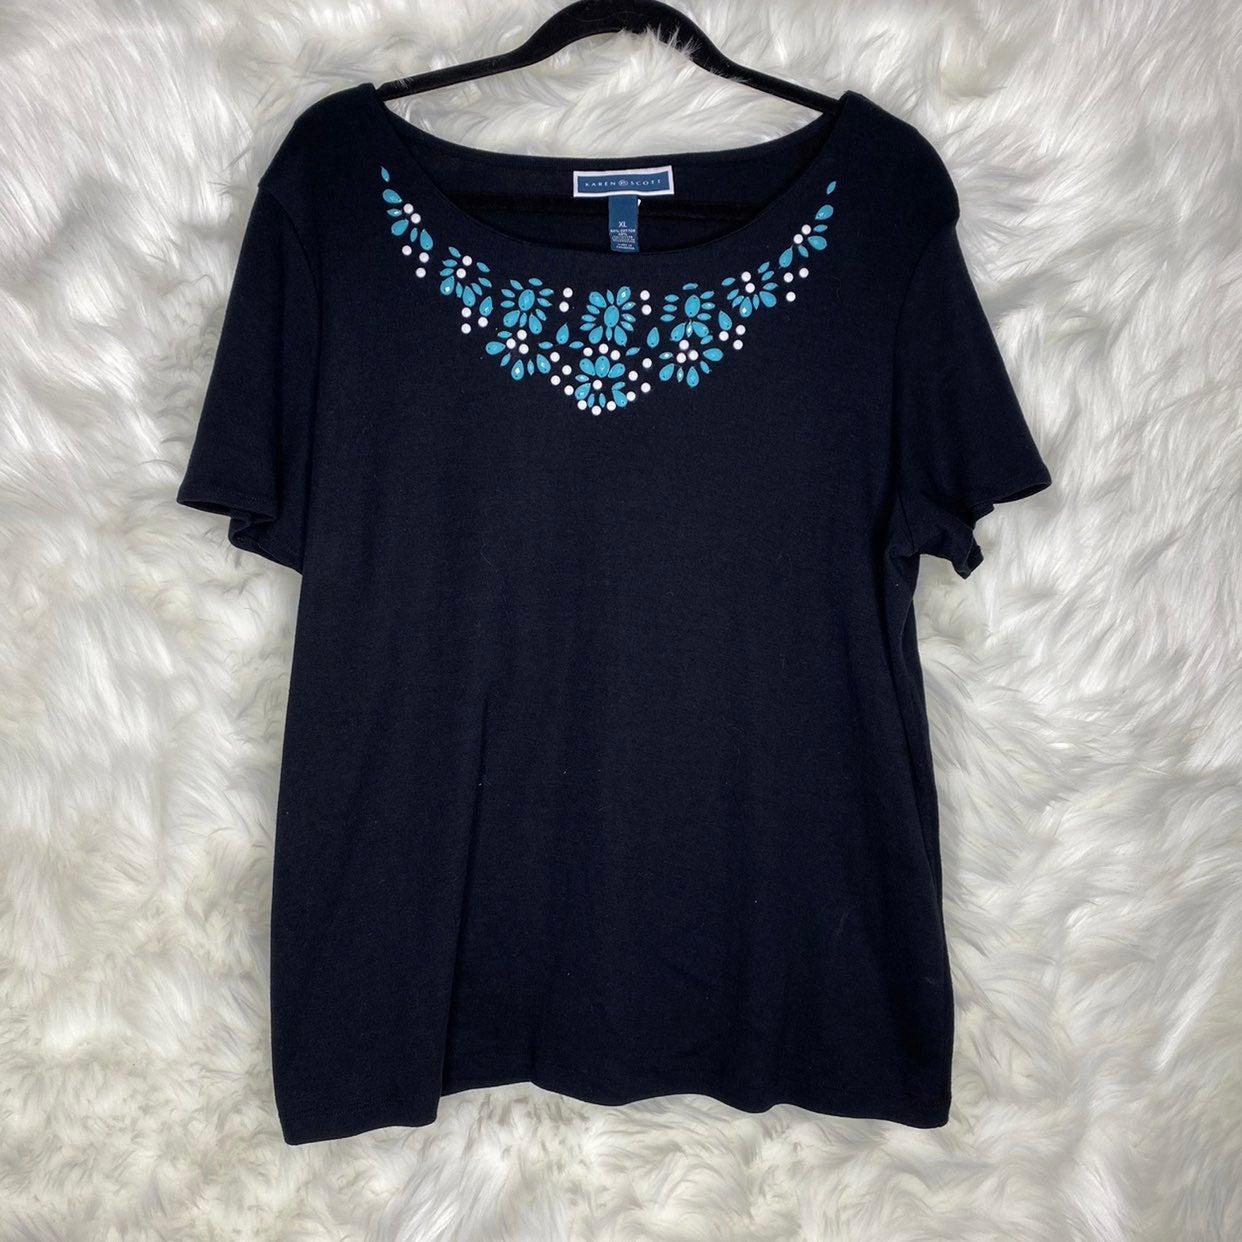 Karen Scott Black Blouse Size XL